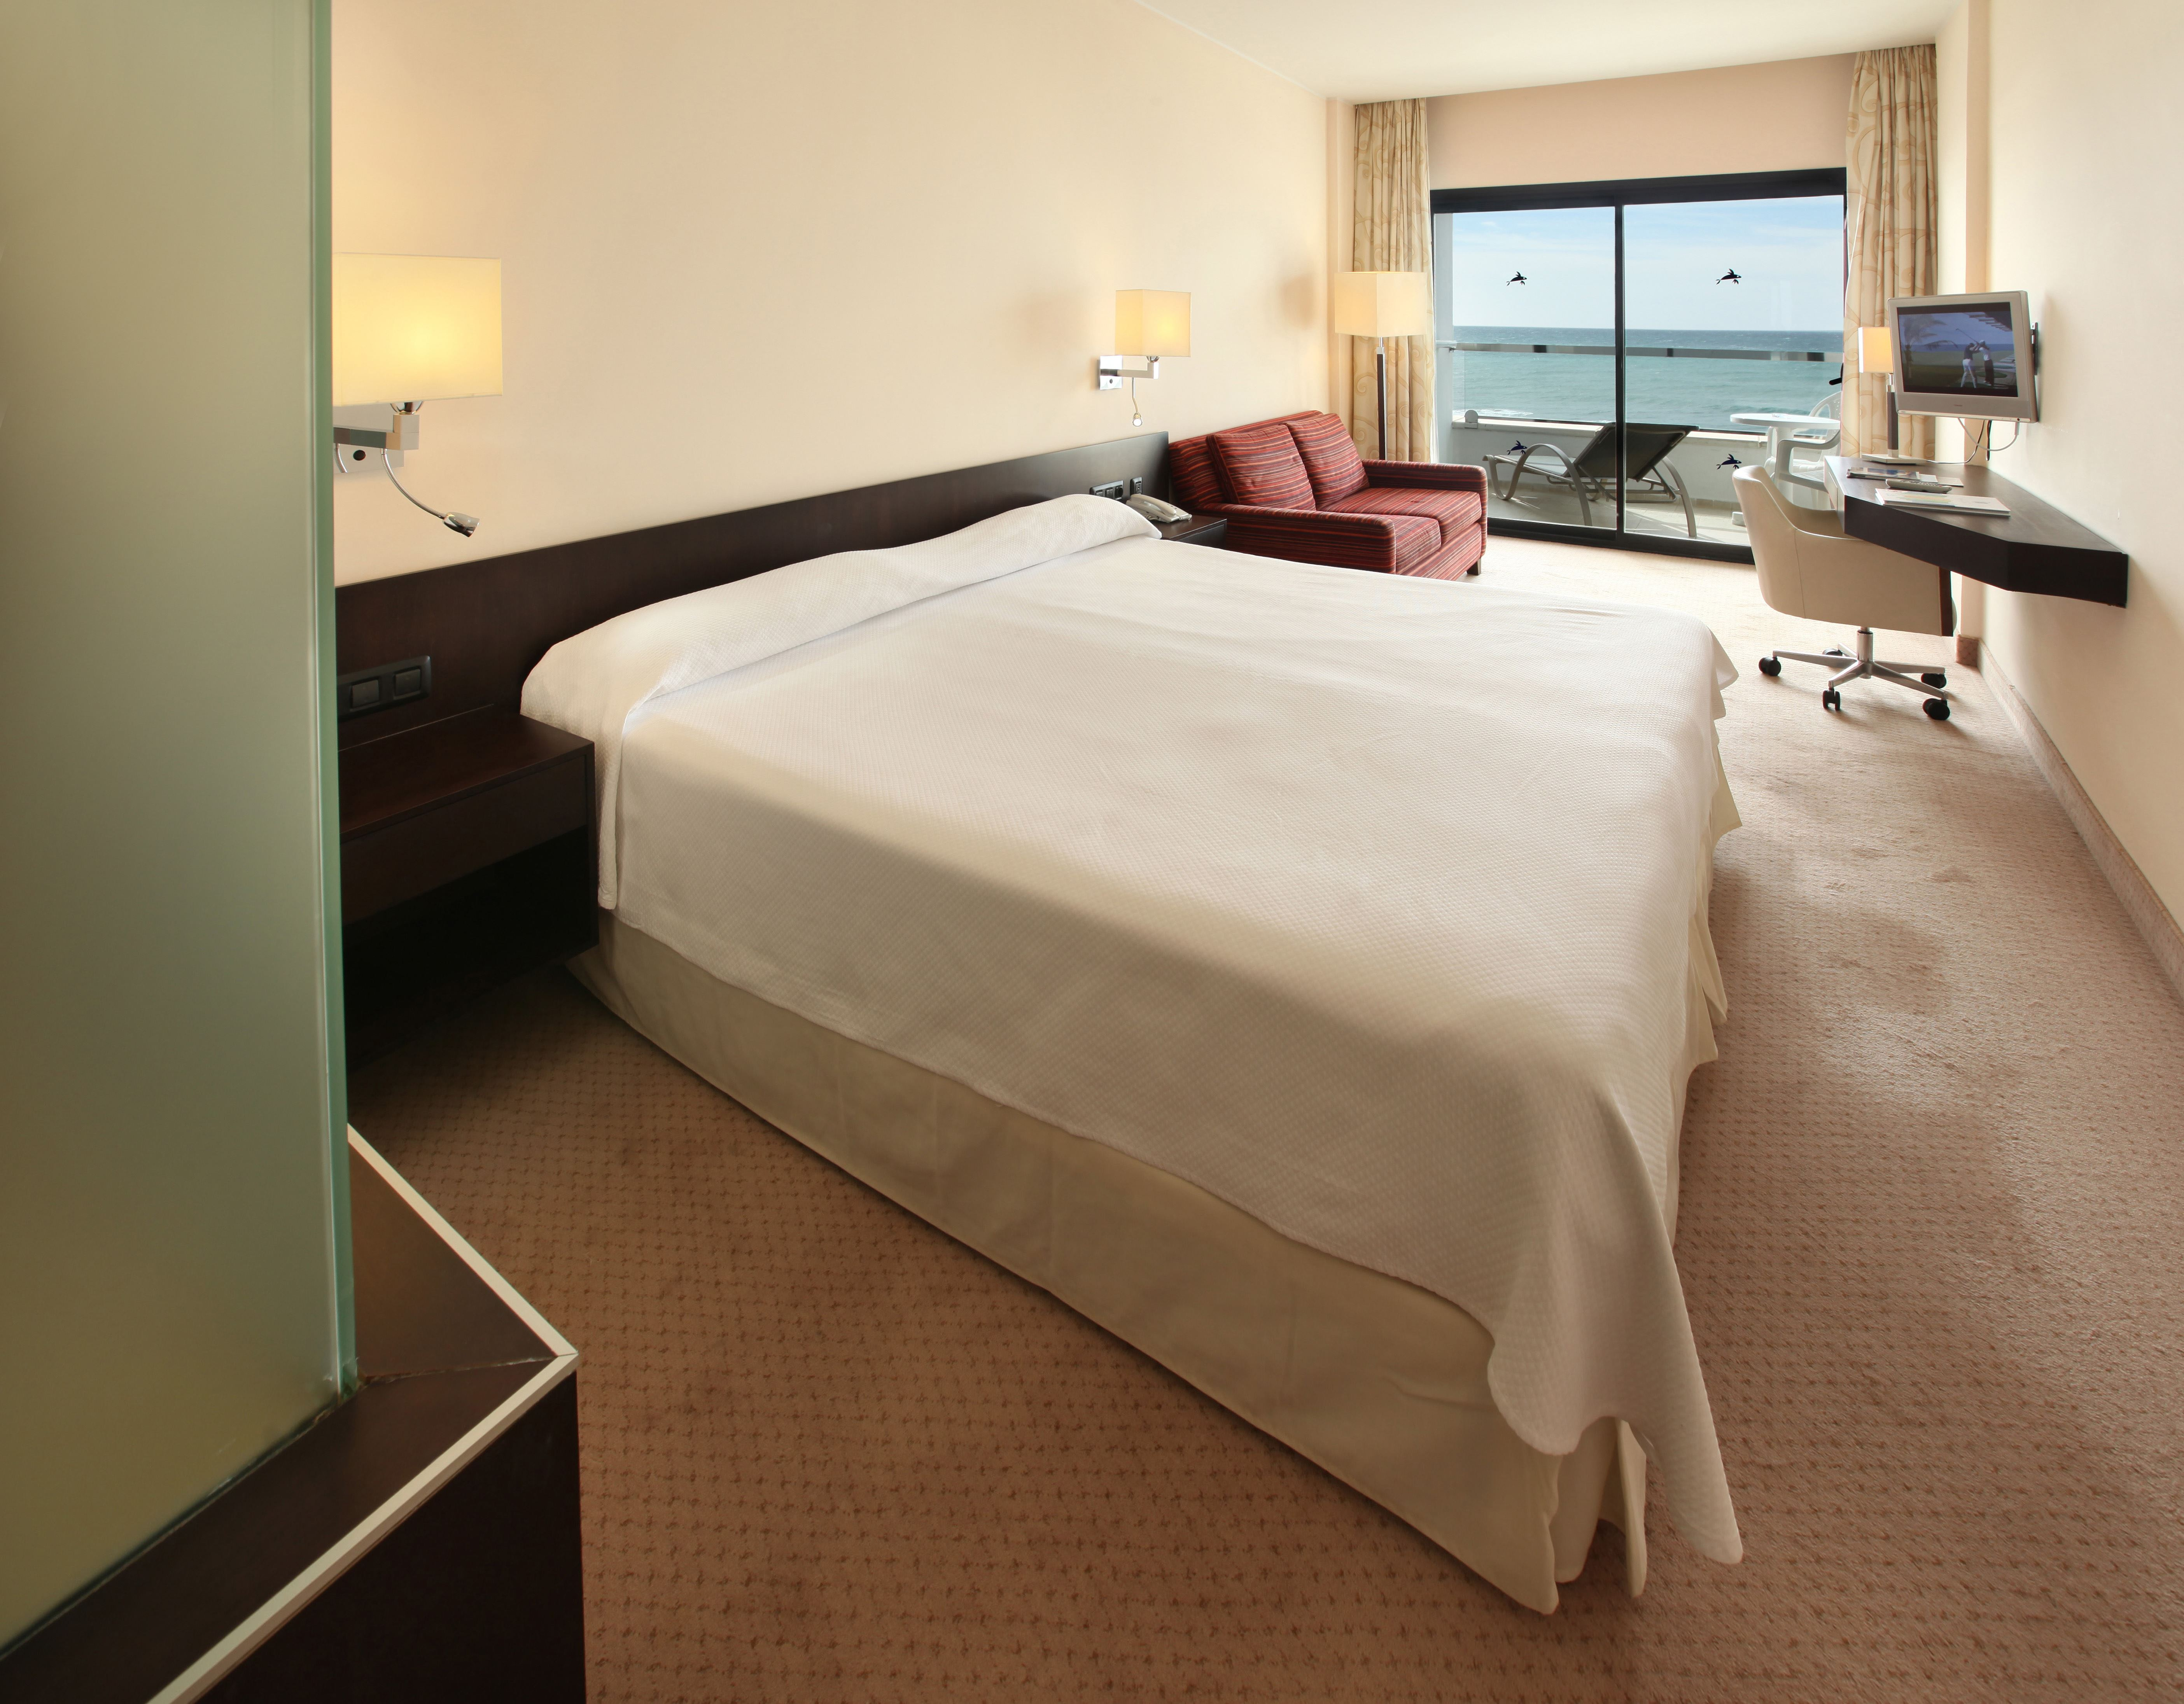 Dubbelrum med havsutsikt IIFA Faro Hotell, Maspalomas Gran Canaria, Signaturresor